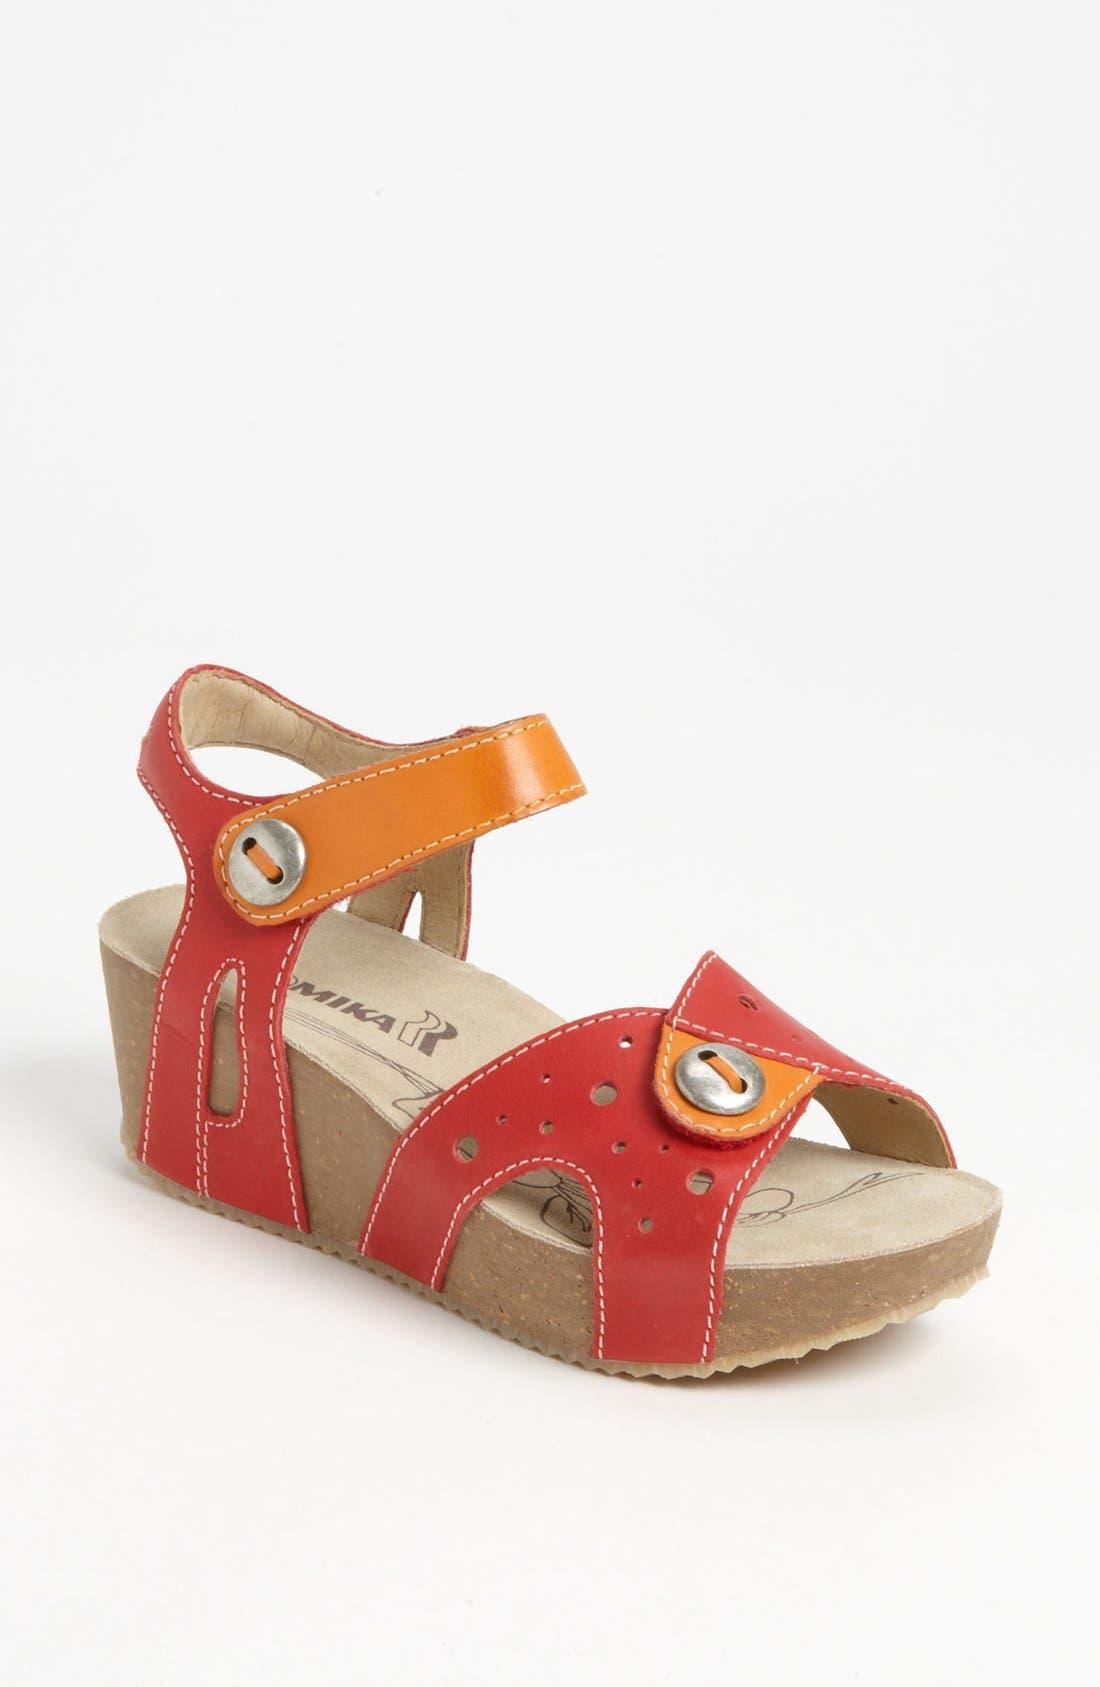 Alternate Image 1 Selected - Romika® 'Florida 05' Sandal